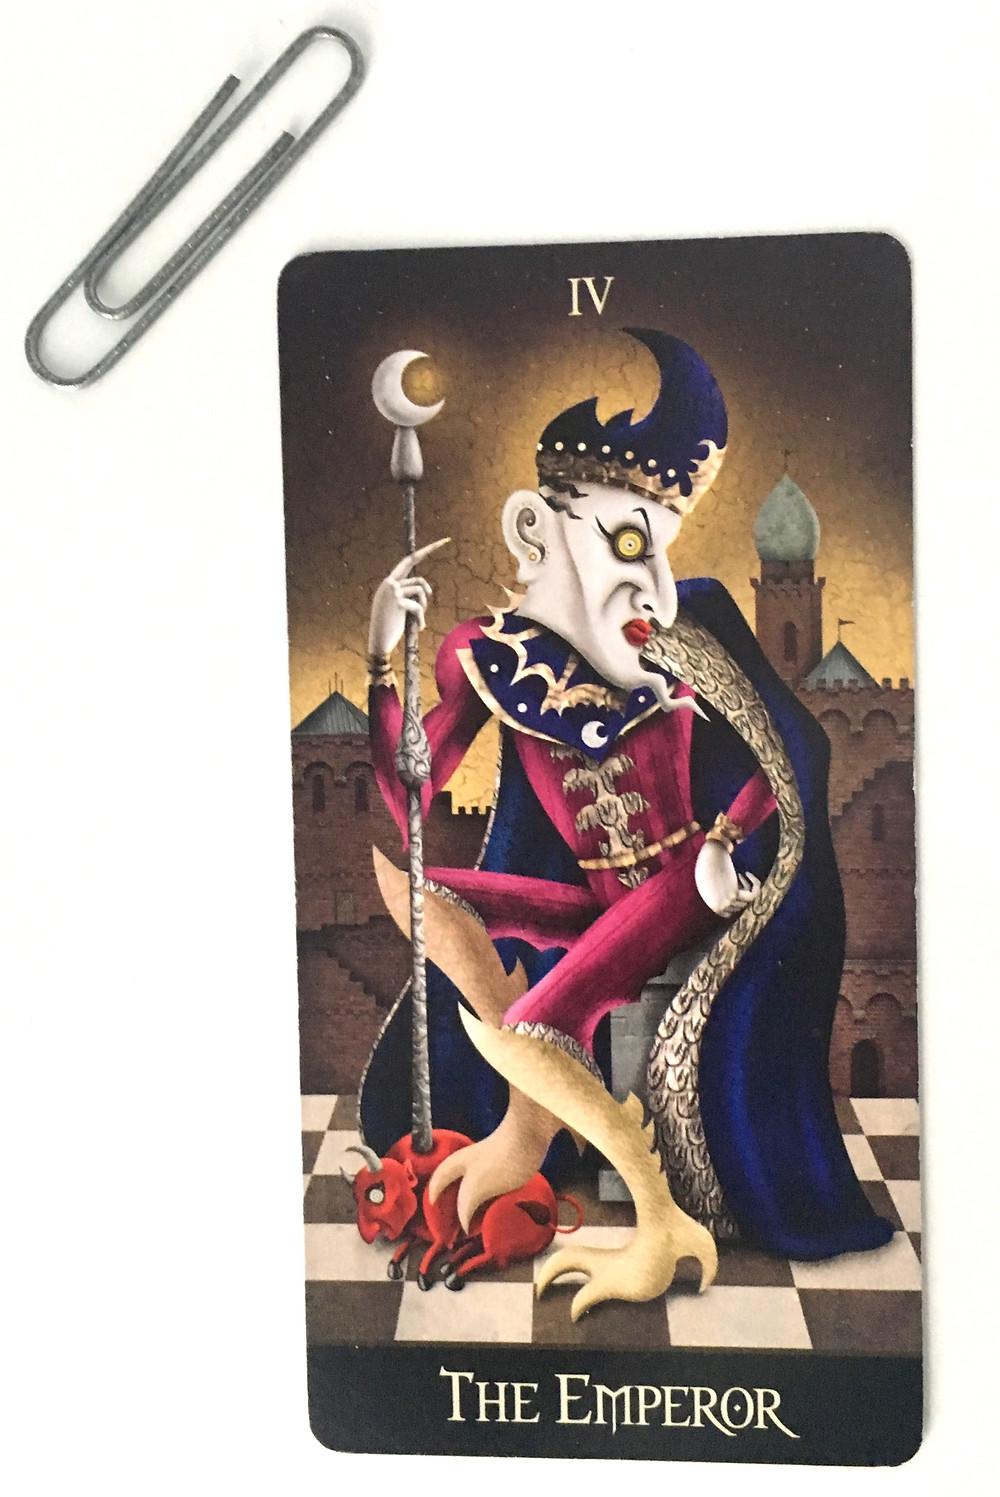 The Emperor - The Deviant Moon Tarot